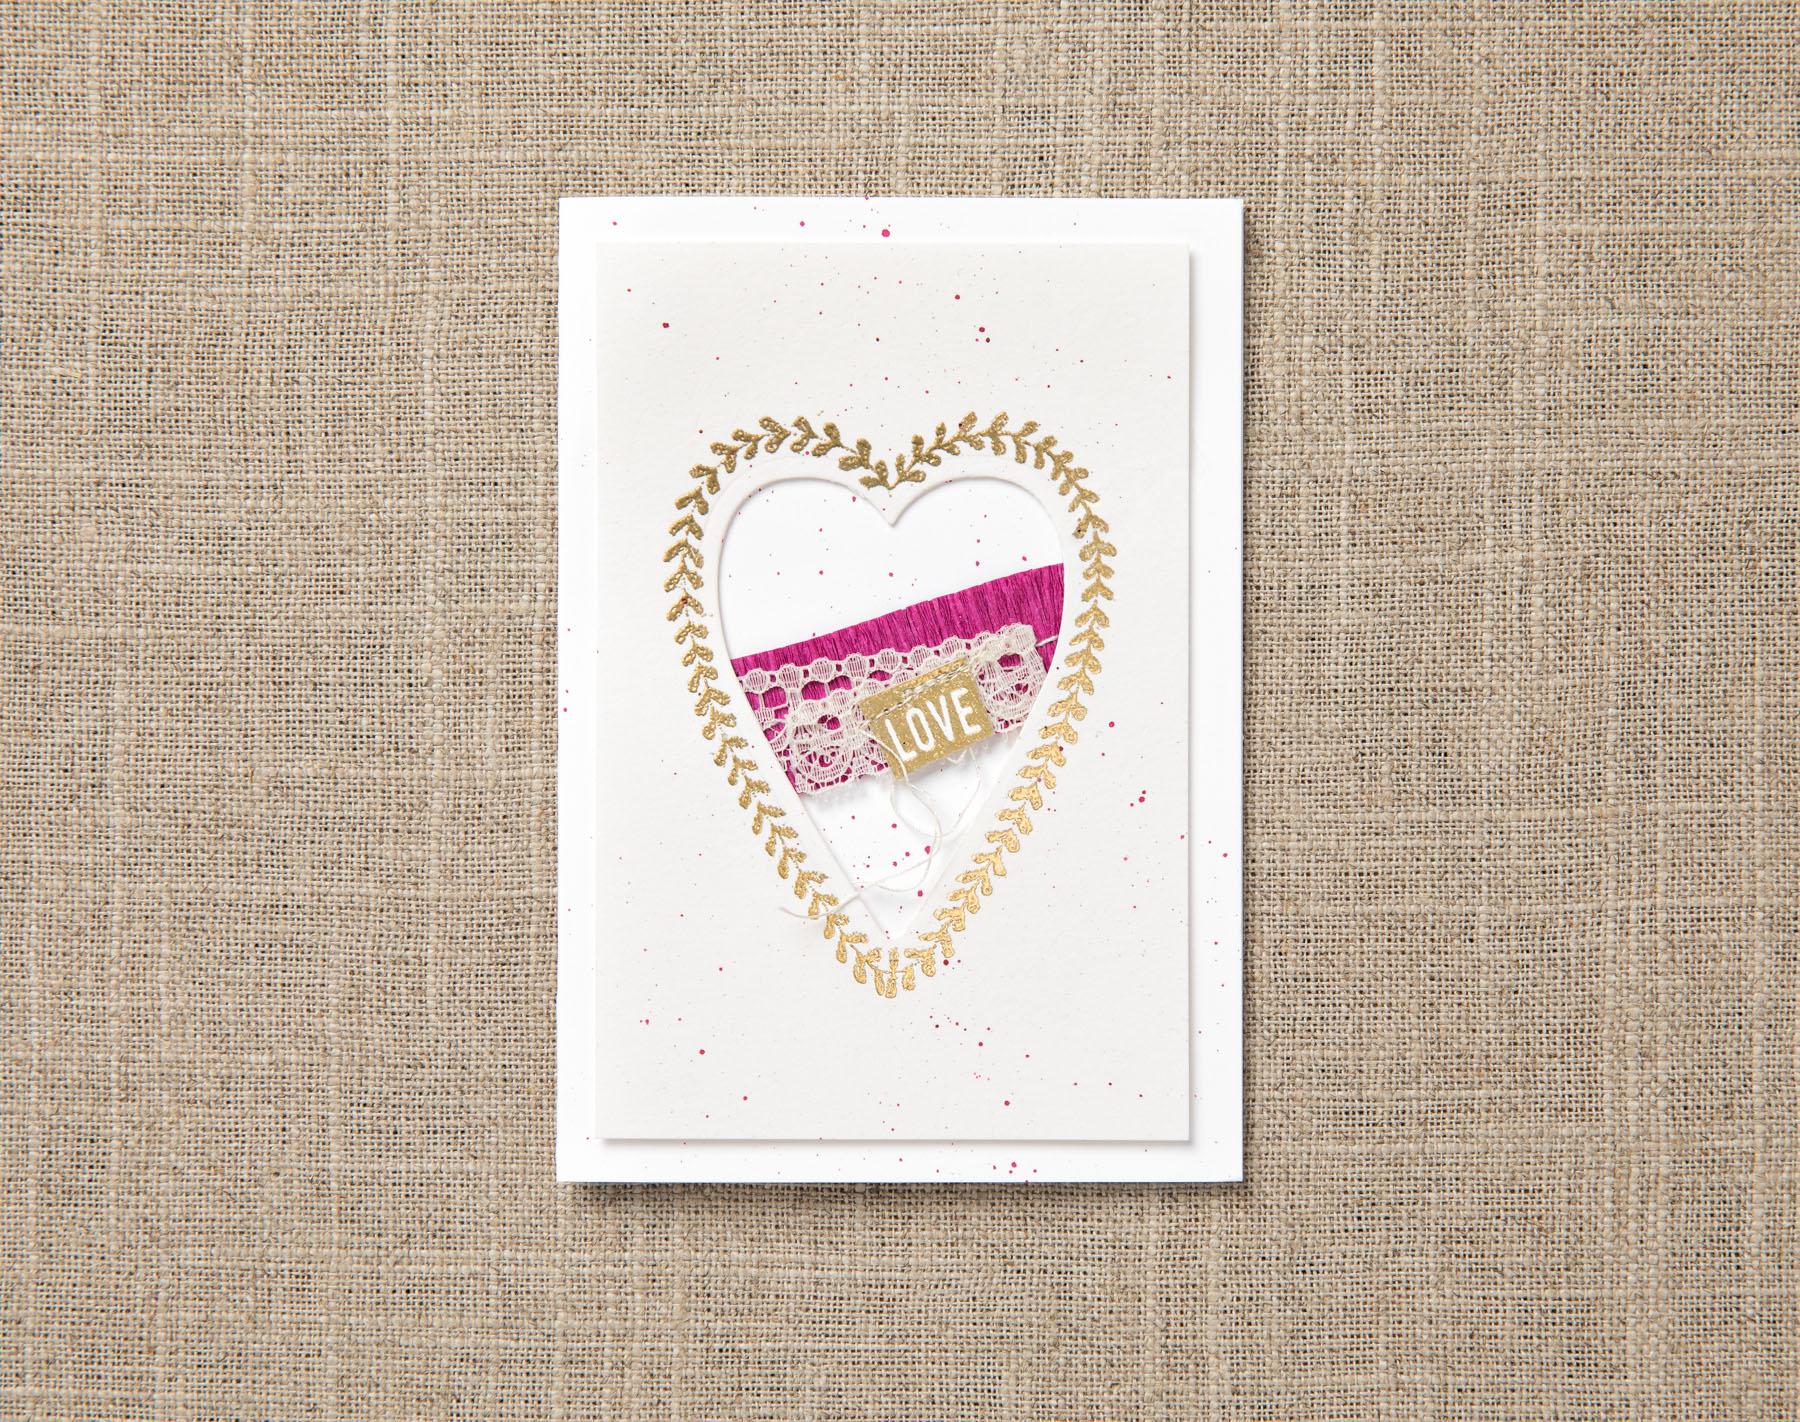 02.01.18_LOVE_CARDS_1.jpg